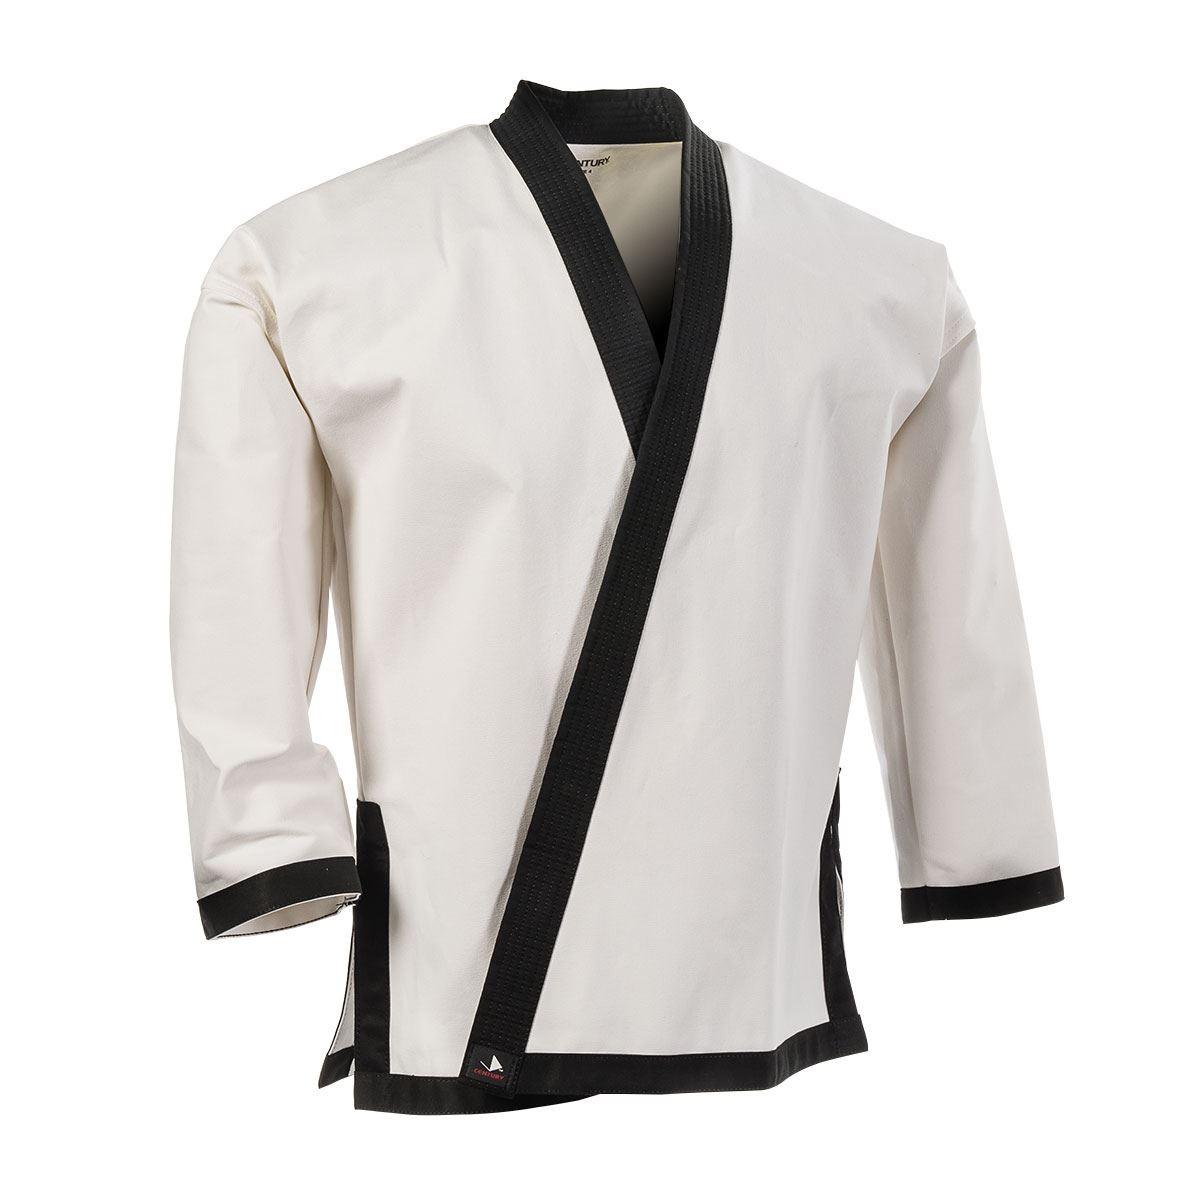 12 oz. Heavyweight Masters Martial Arts Karate Jacket